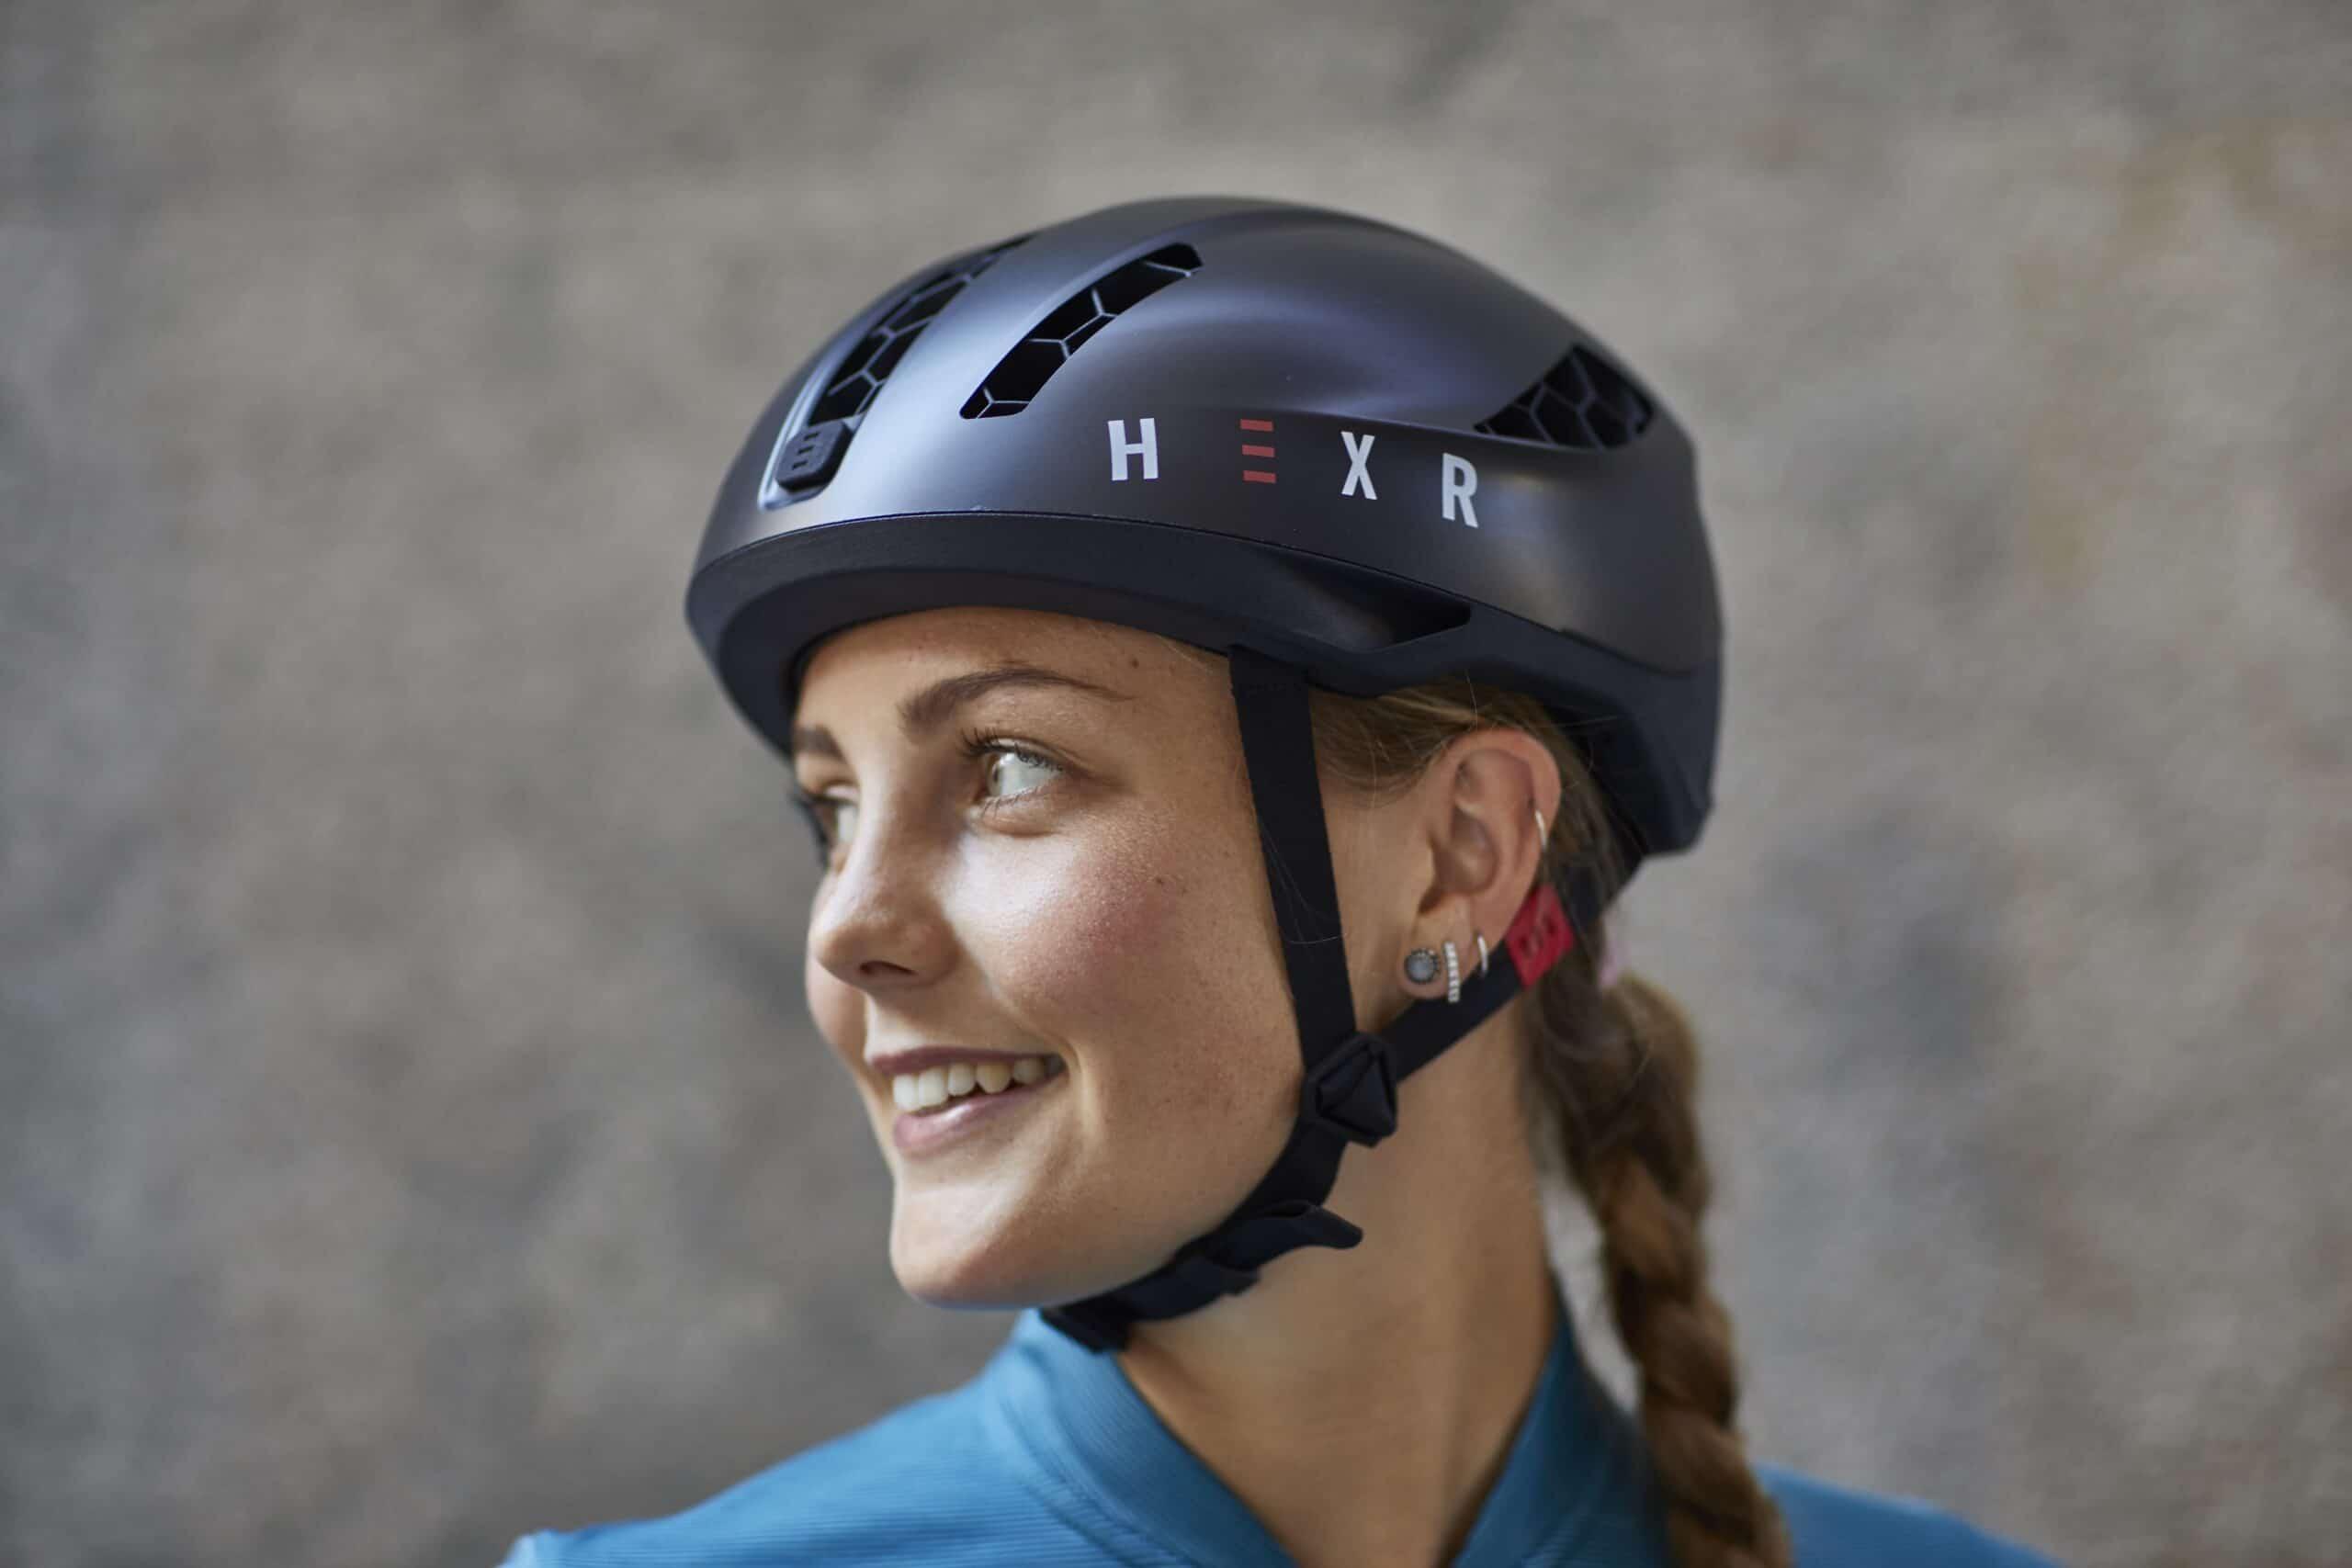 HEXR Smartphone Cycling Helmet Fitting App